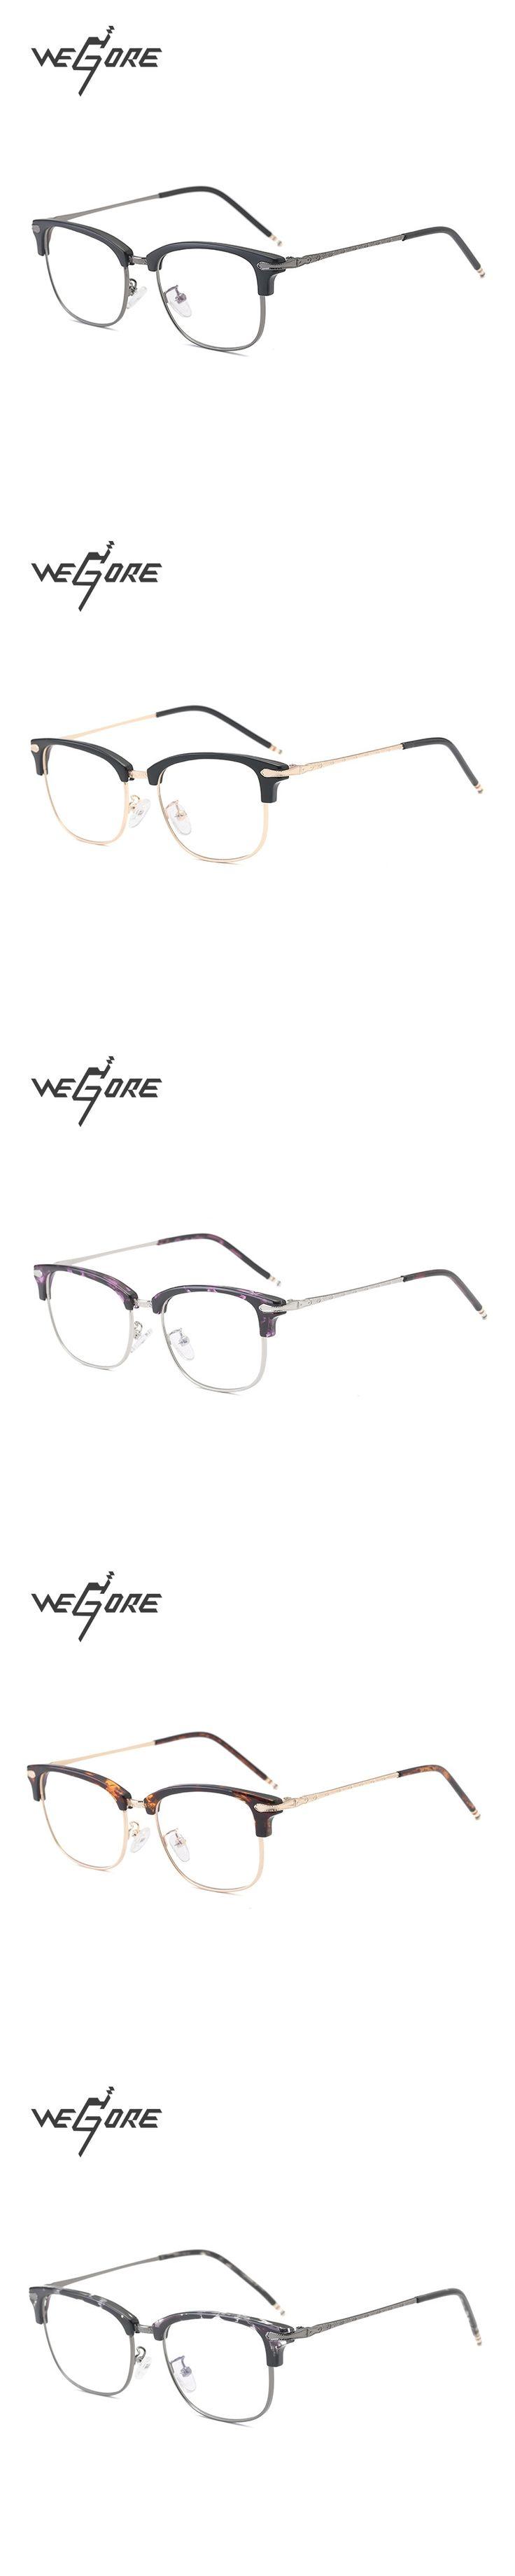 WEGORE TR90 Men Glasses Frame Vintage Optical Brand Myopia Designer Clear Eyeglasses Frame WG2060